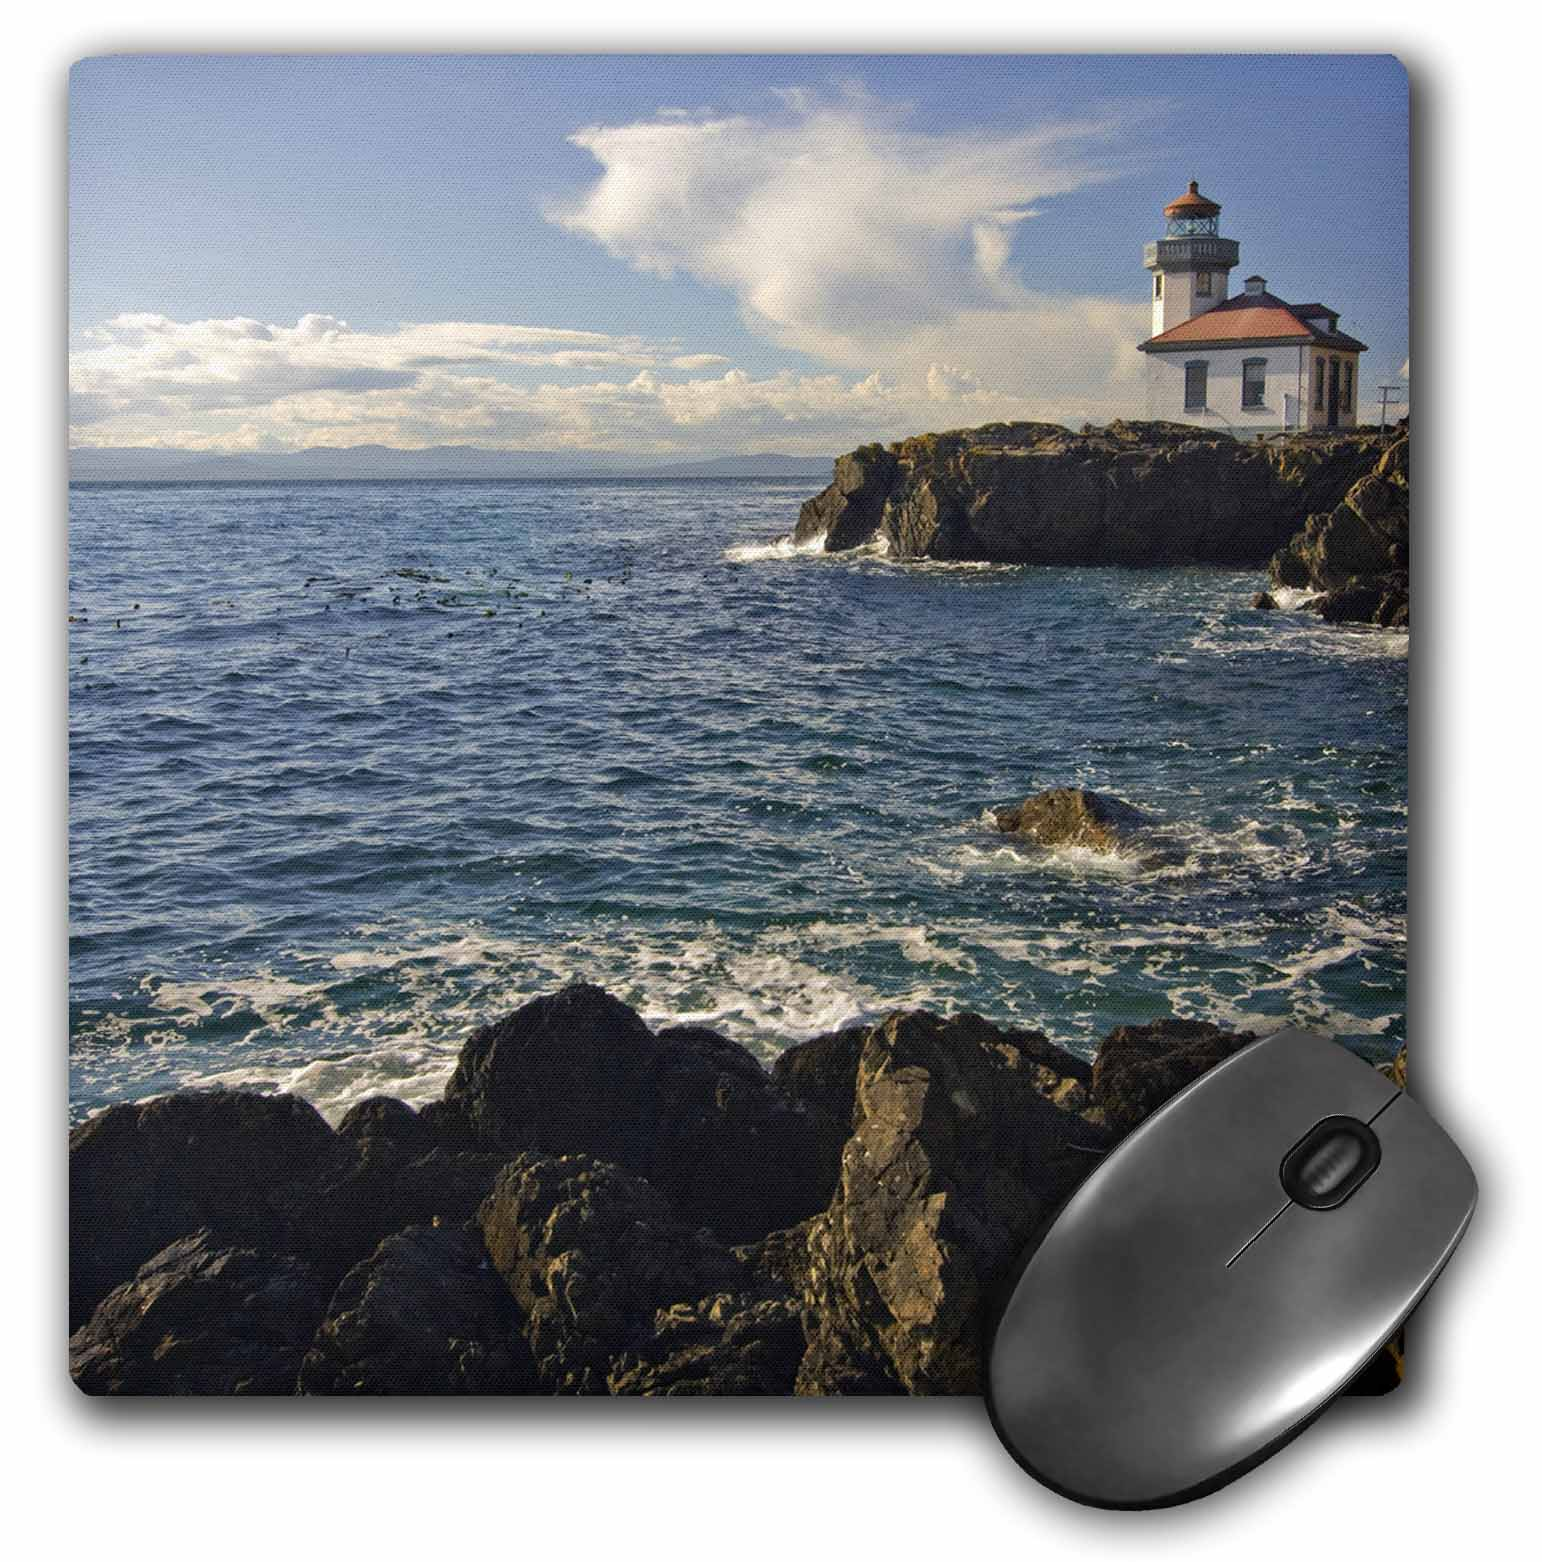 3dRose Washington, San Juans, Lime Kiln Point Lighthouse - US48 DSV0236 - David Svilar, Mouse Pad, 8 by 8 inches